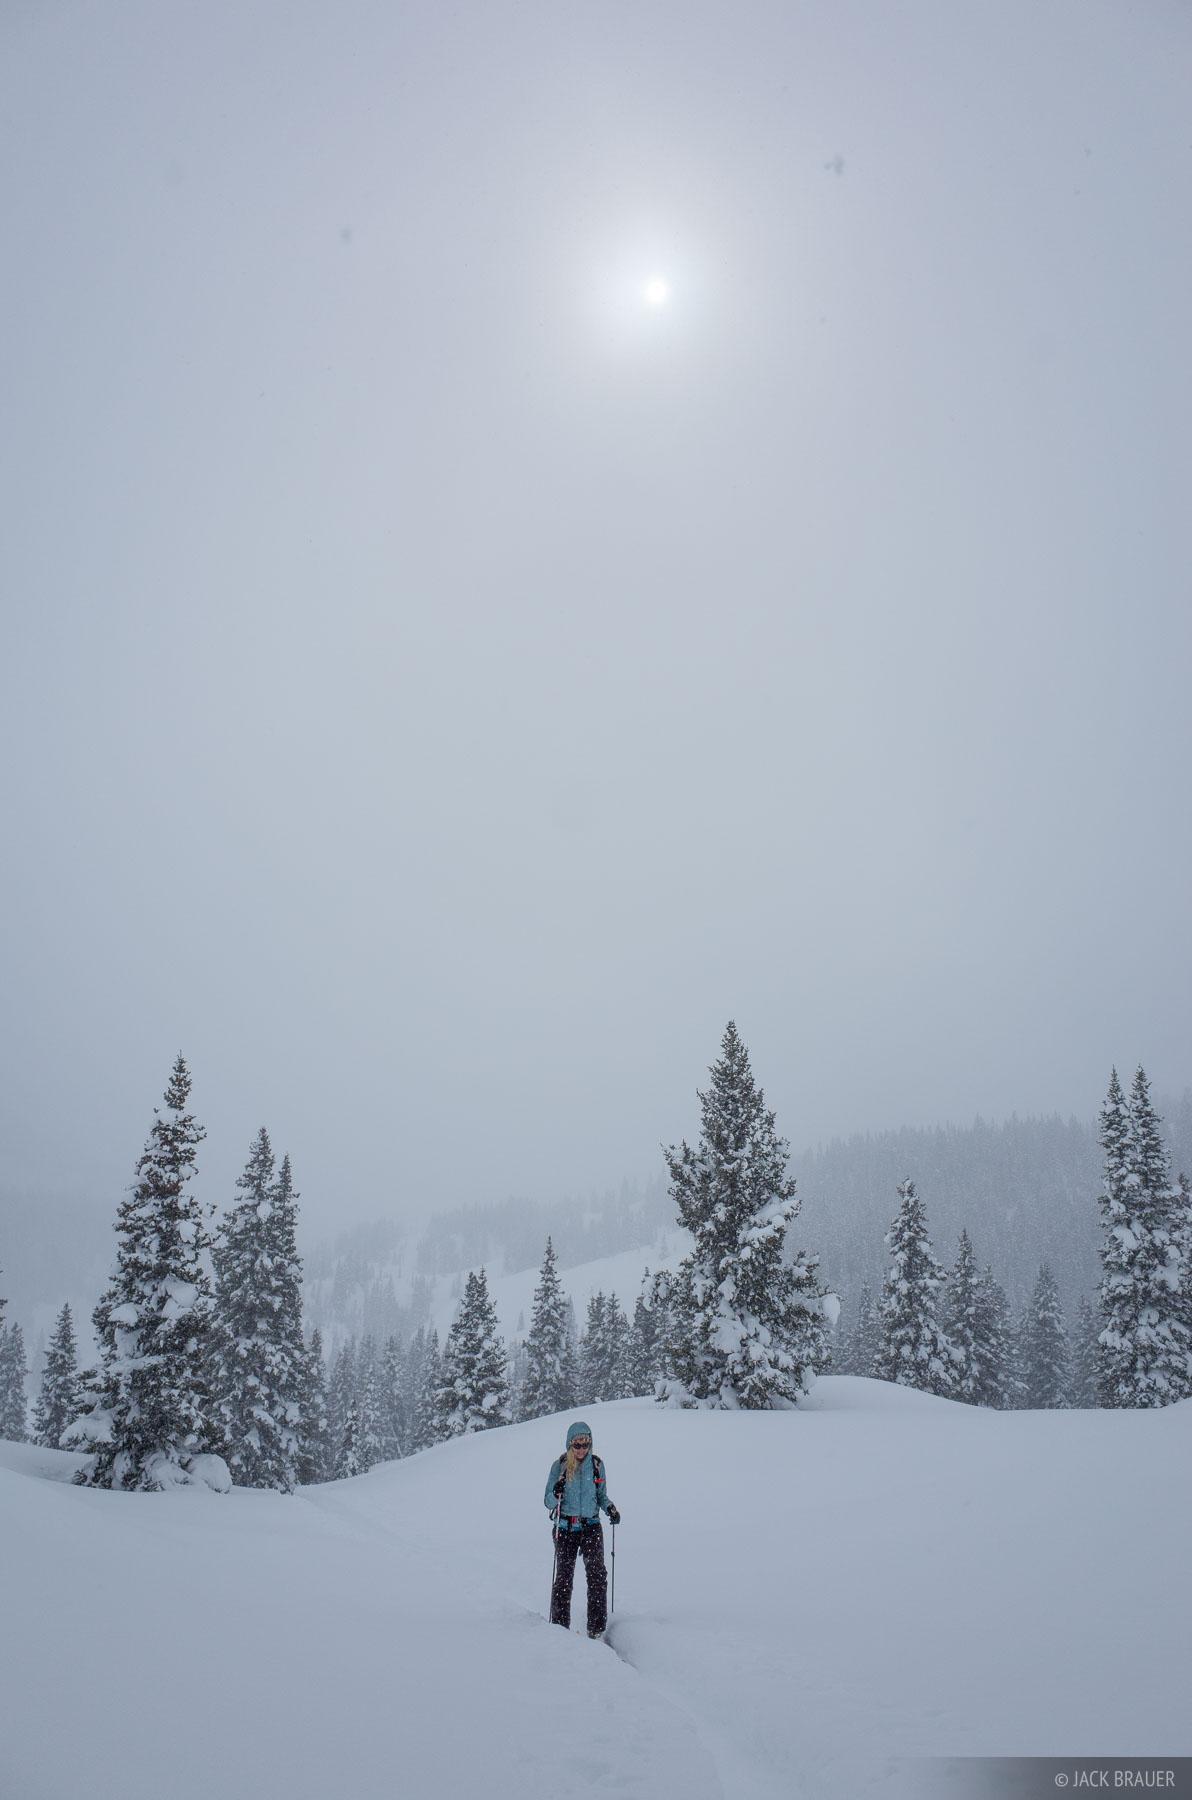 Colorado, Red Mountain Pass, San Juan Mountains, skiing, skinning, hiking, February, winter, active, 2015